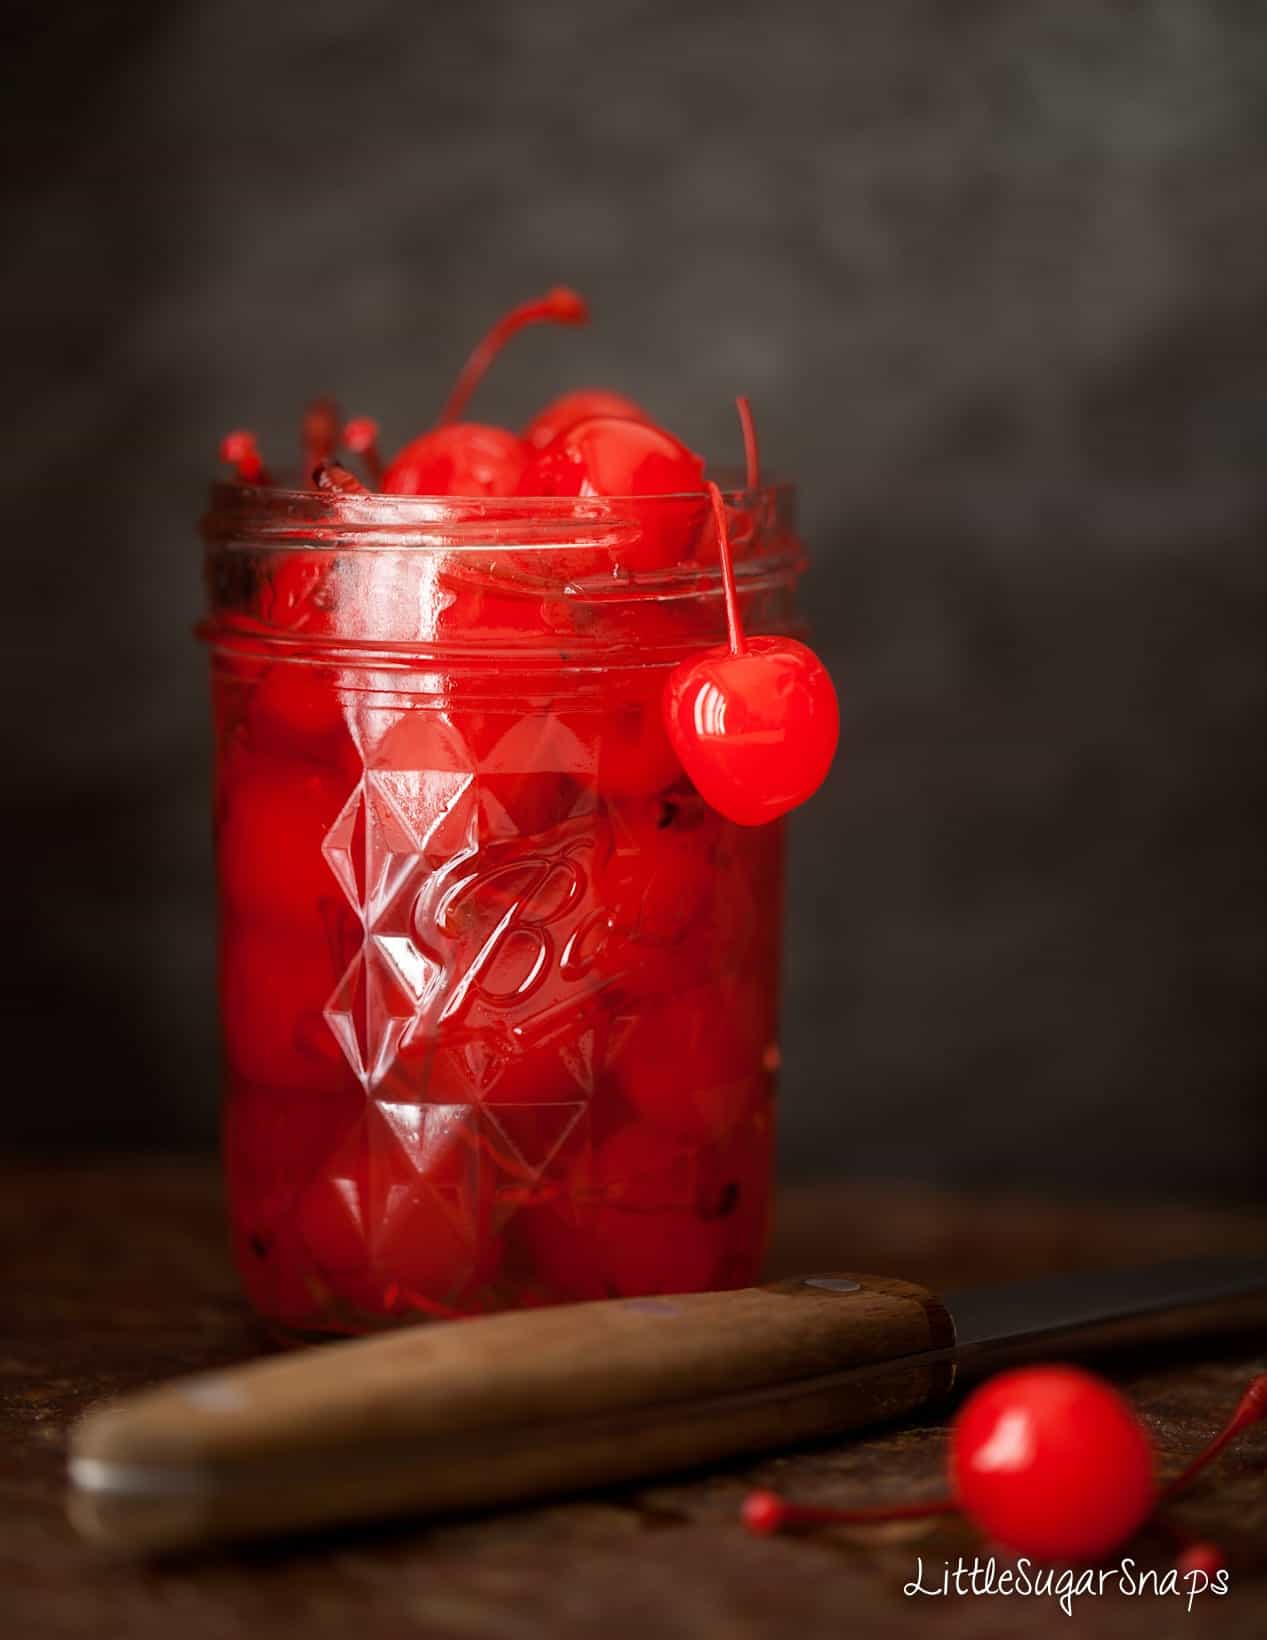 A jar of maraschino cocktail cherries.